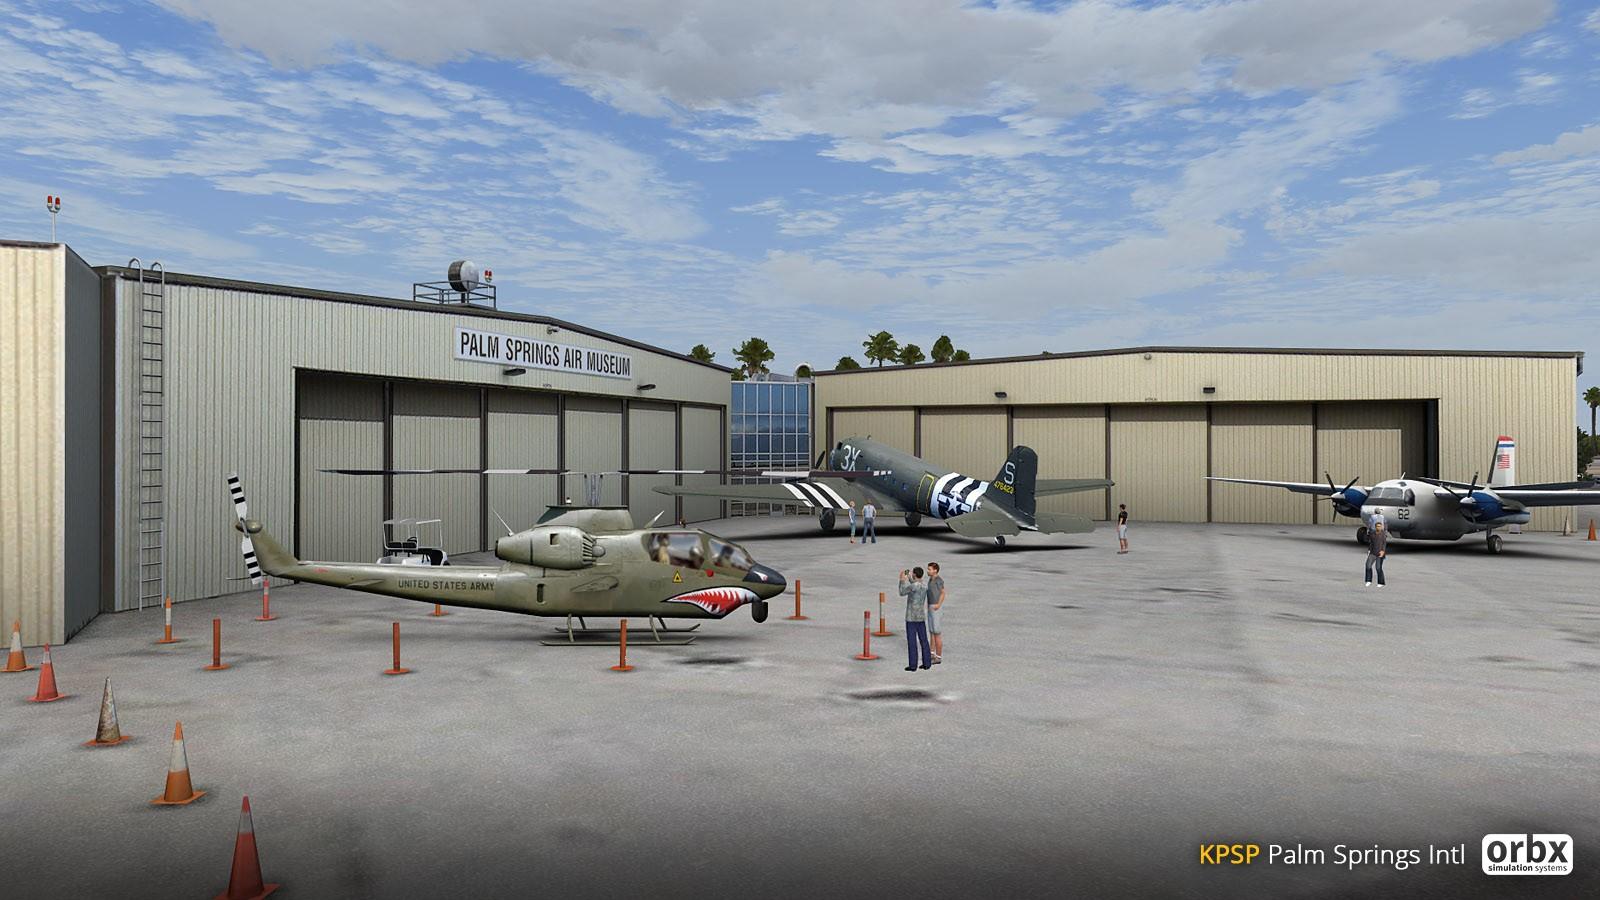 KPSP Palm Springs International Airport